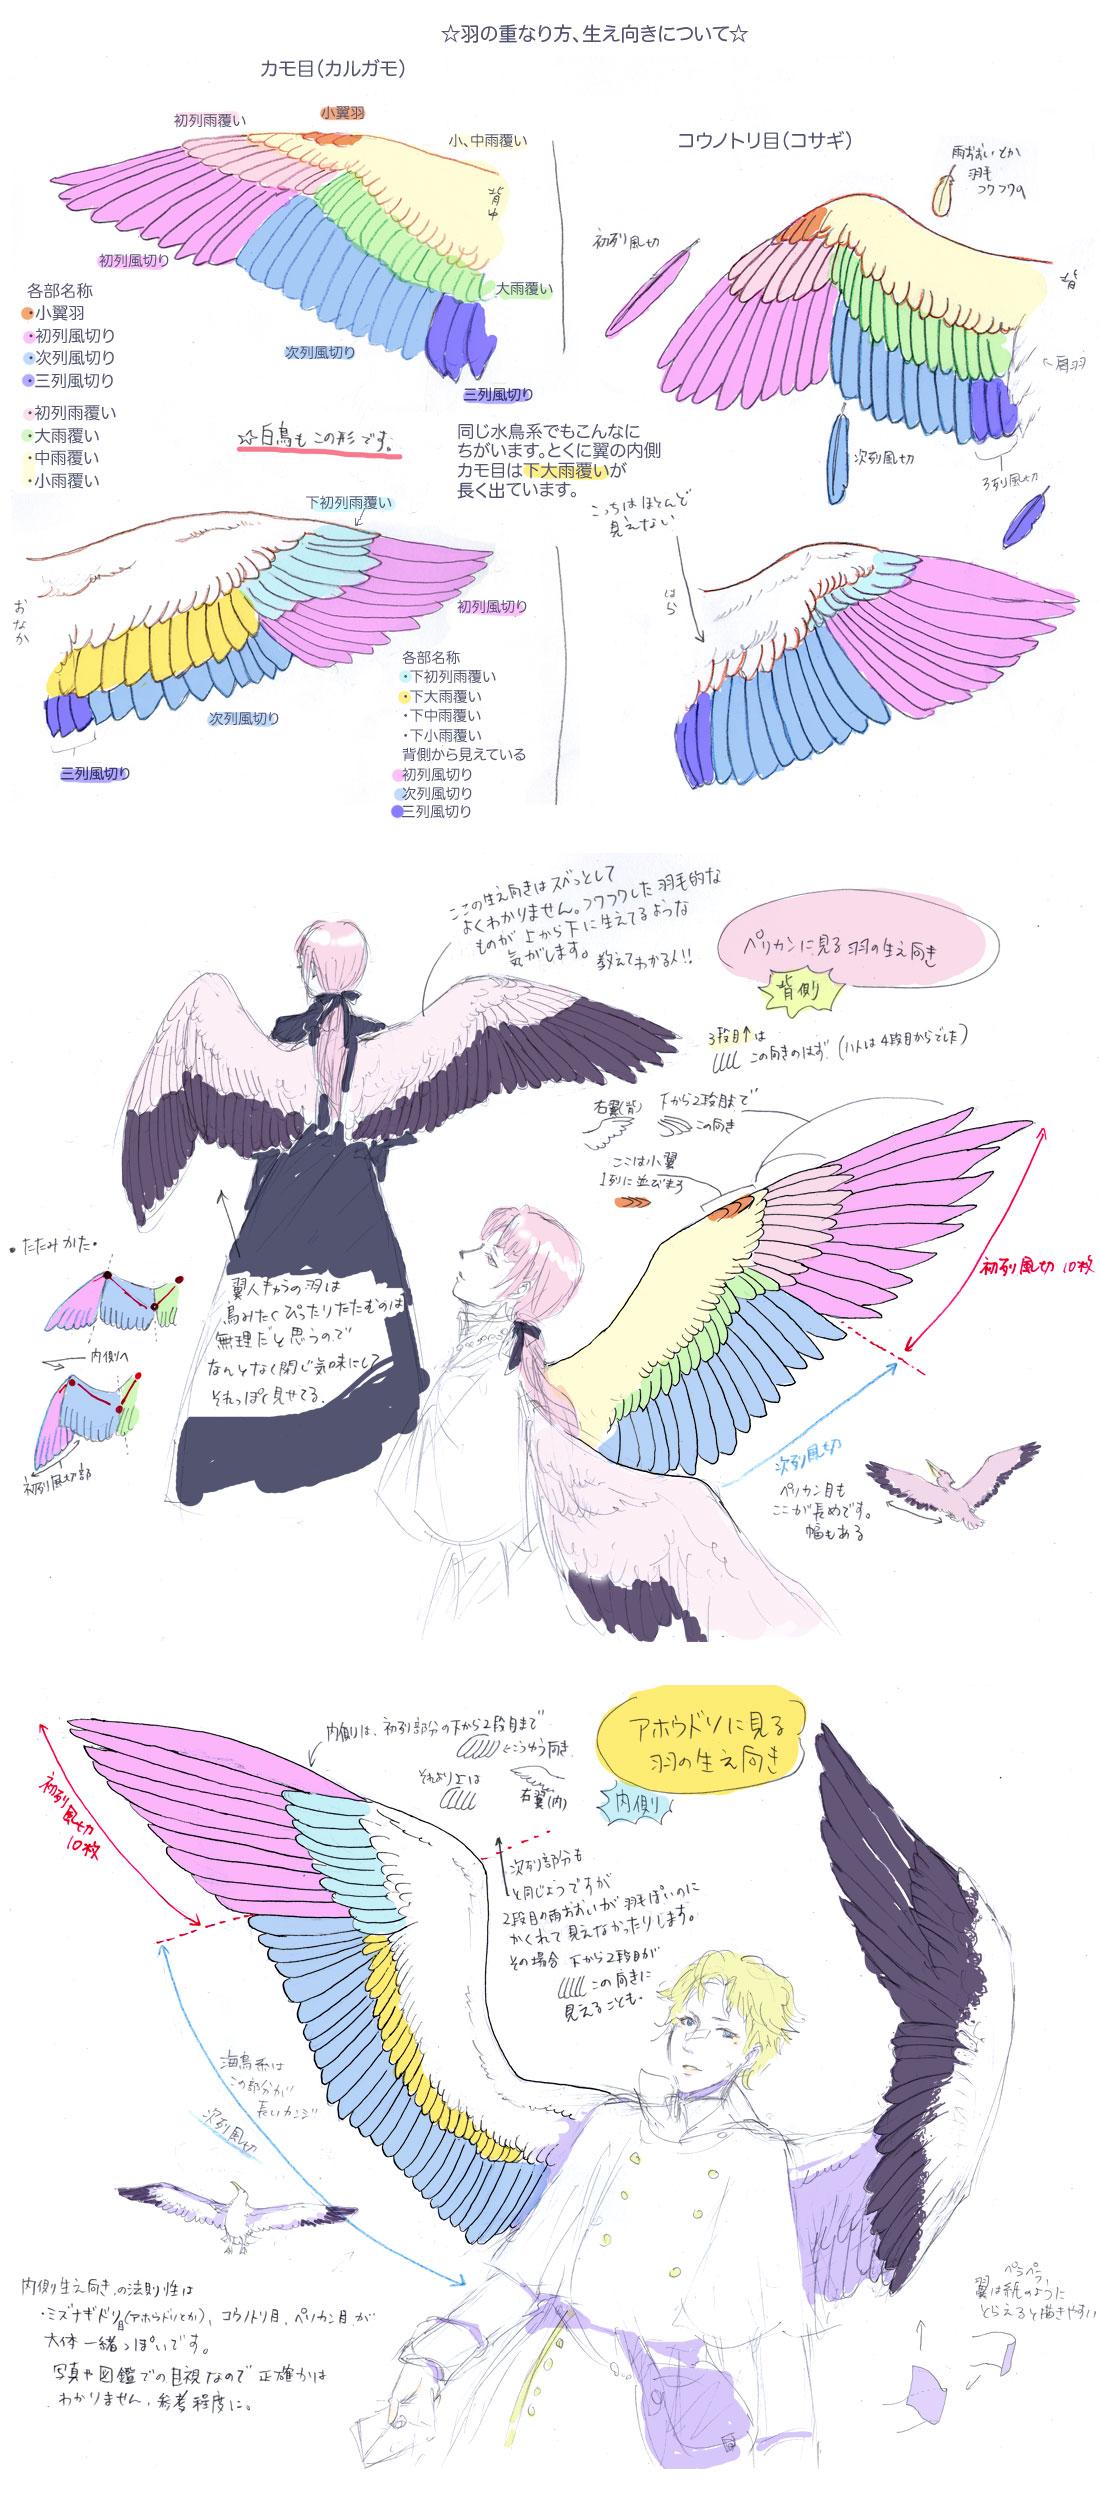 Blog Entry 43 on Bird Anatomy